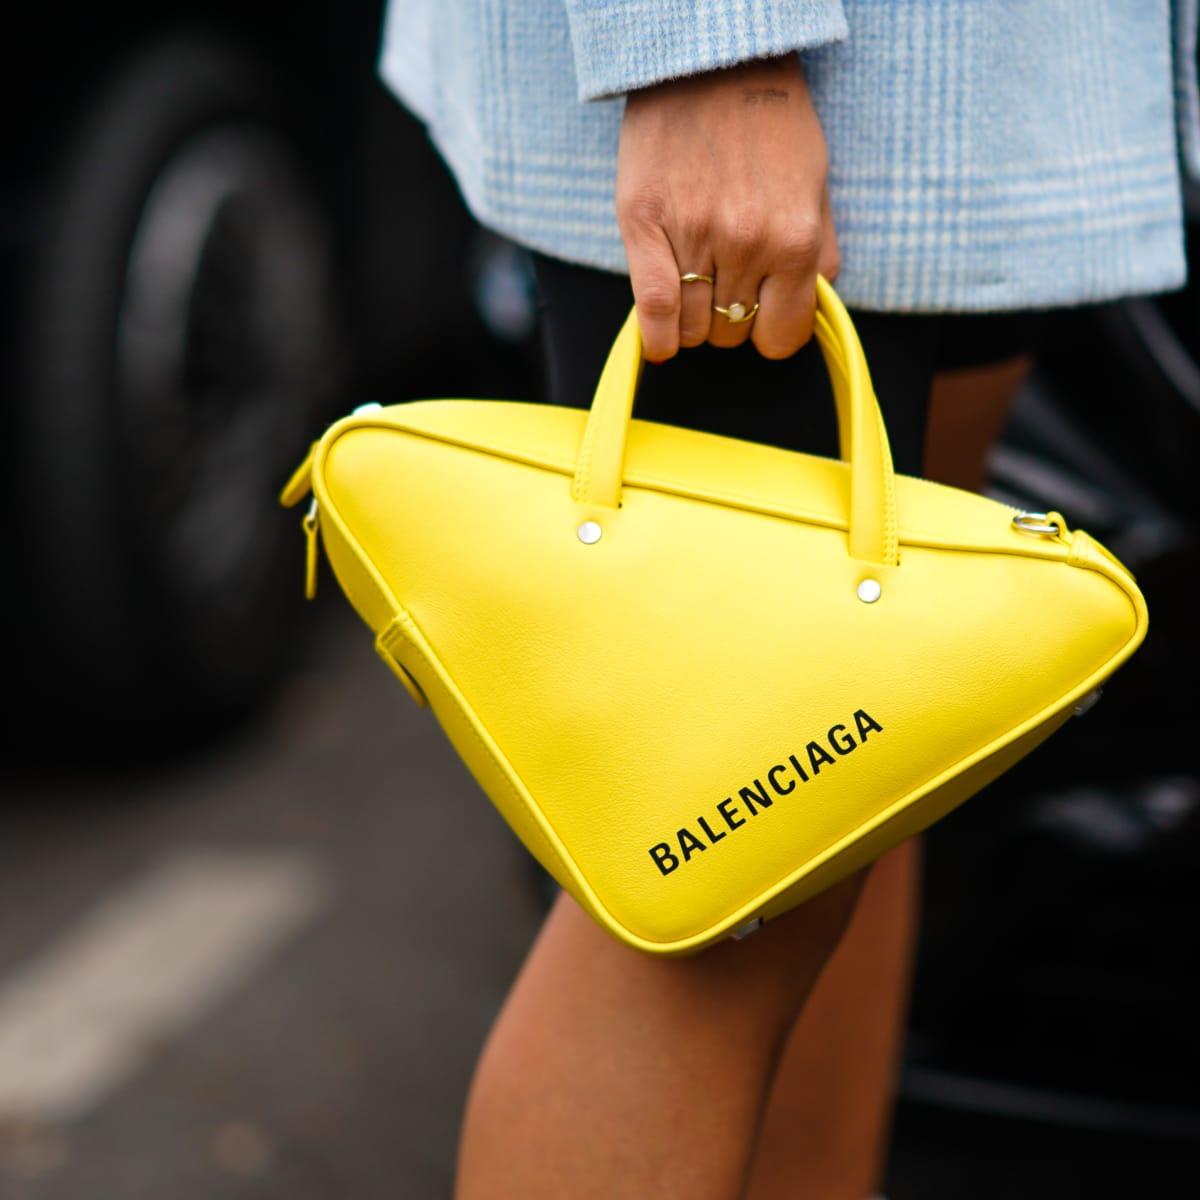 Balenciaga Is Growing Faster Than Any